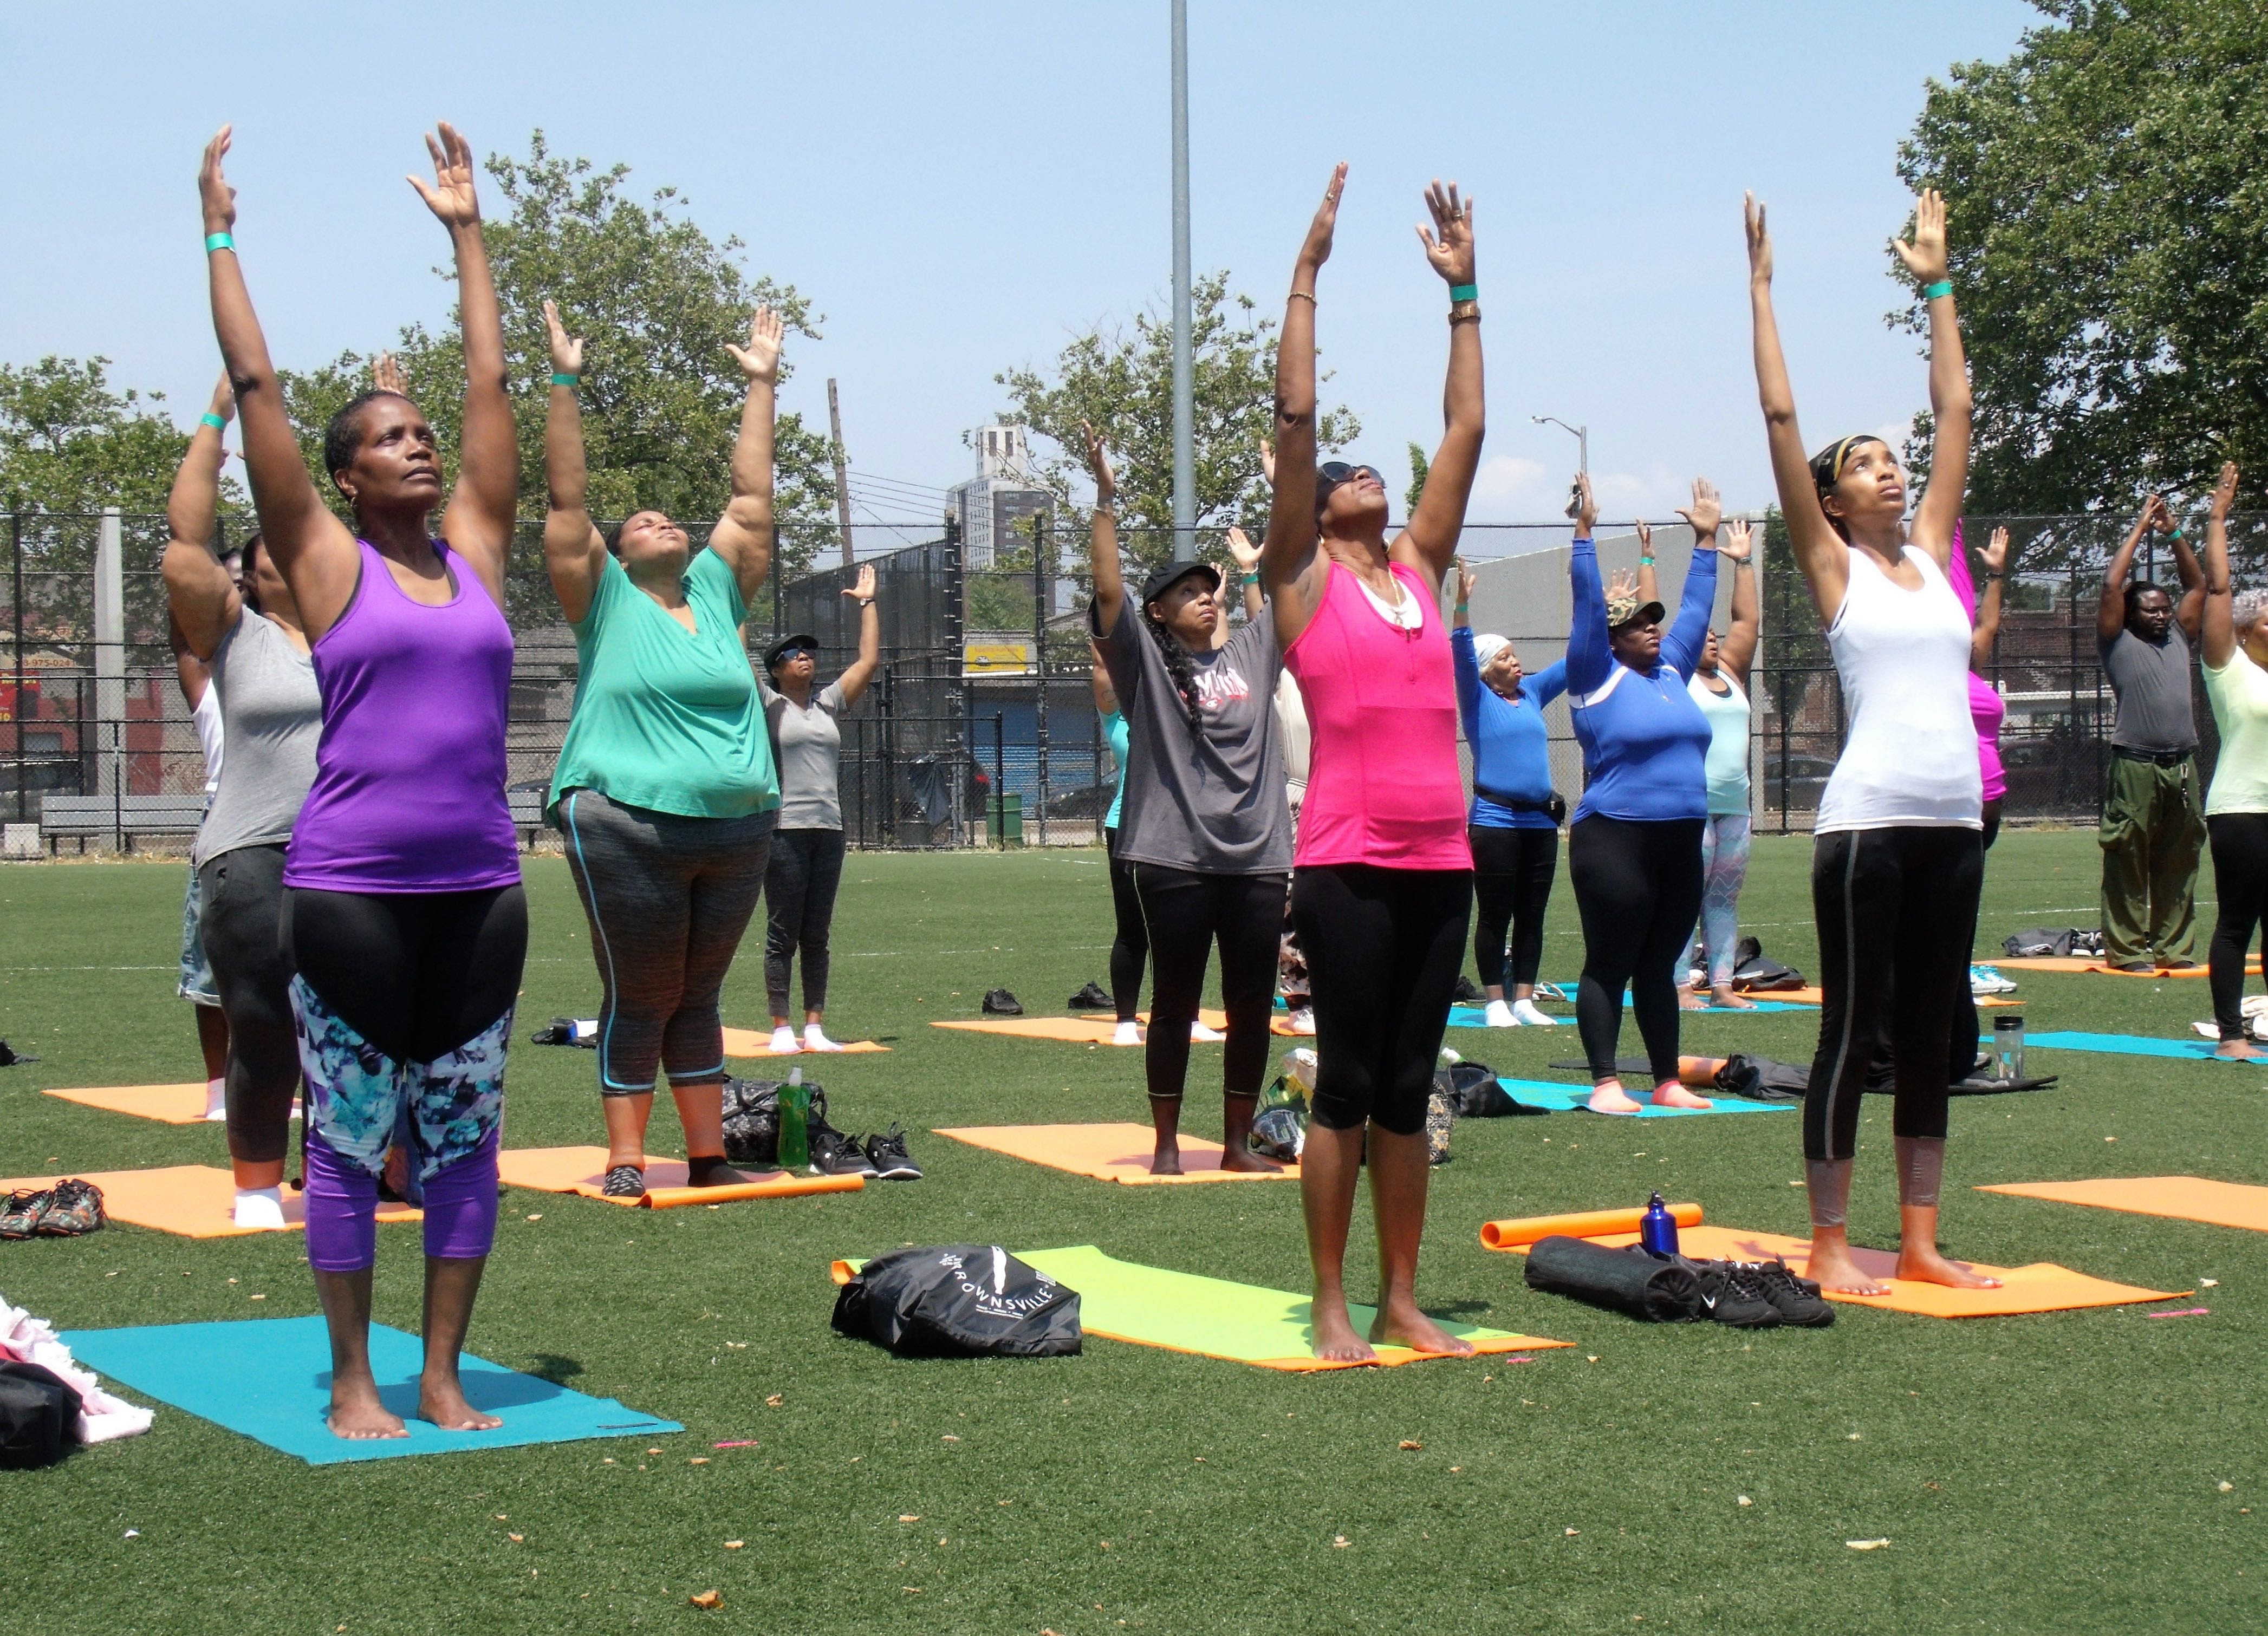 Upward Salute Pose - Breathe Brownsville Brooklyn Yoga Festival